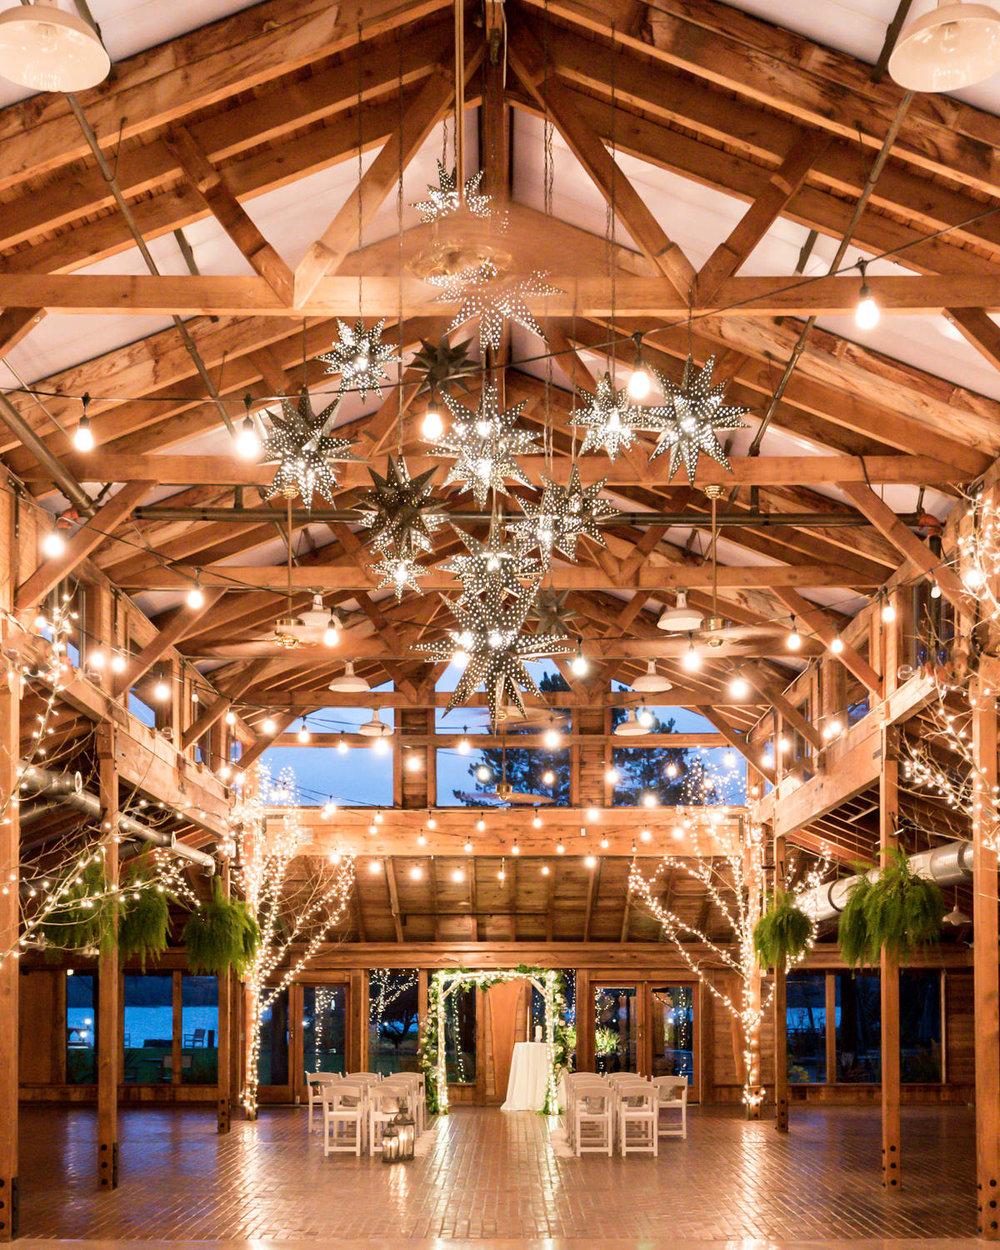 Kiana Lodge Poulsbo Wedding Rustic Lace Gown-8.jpg